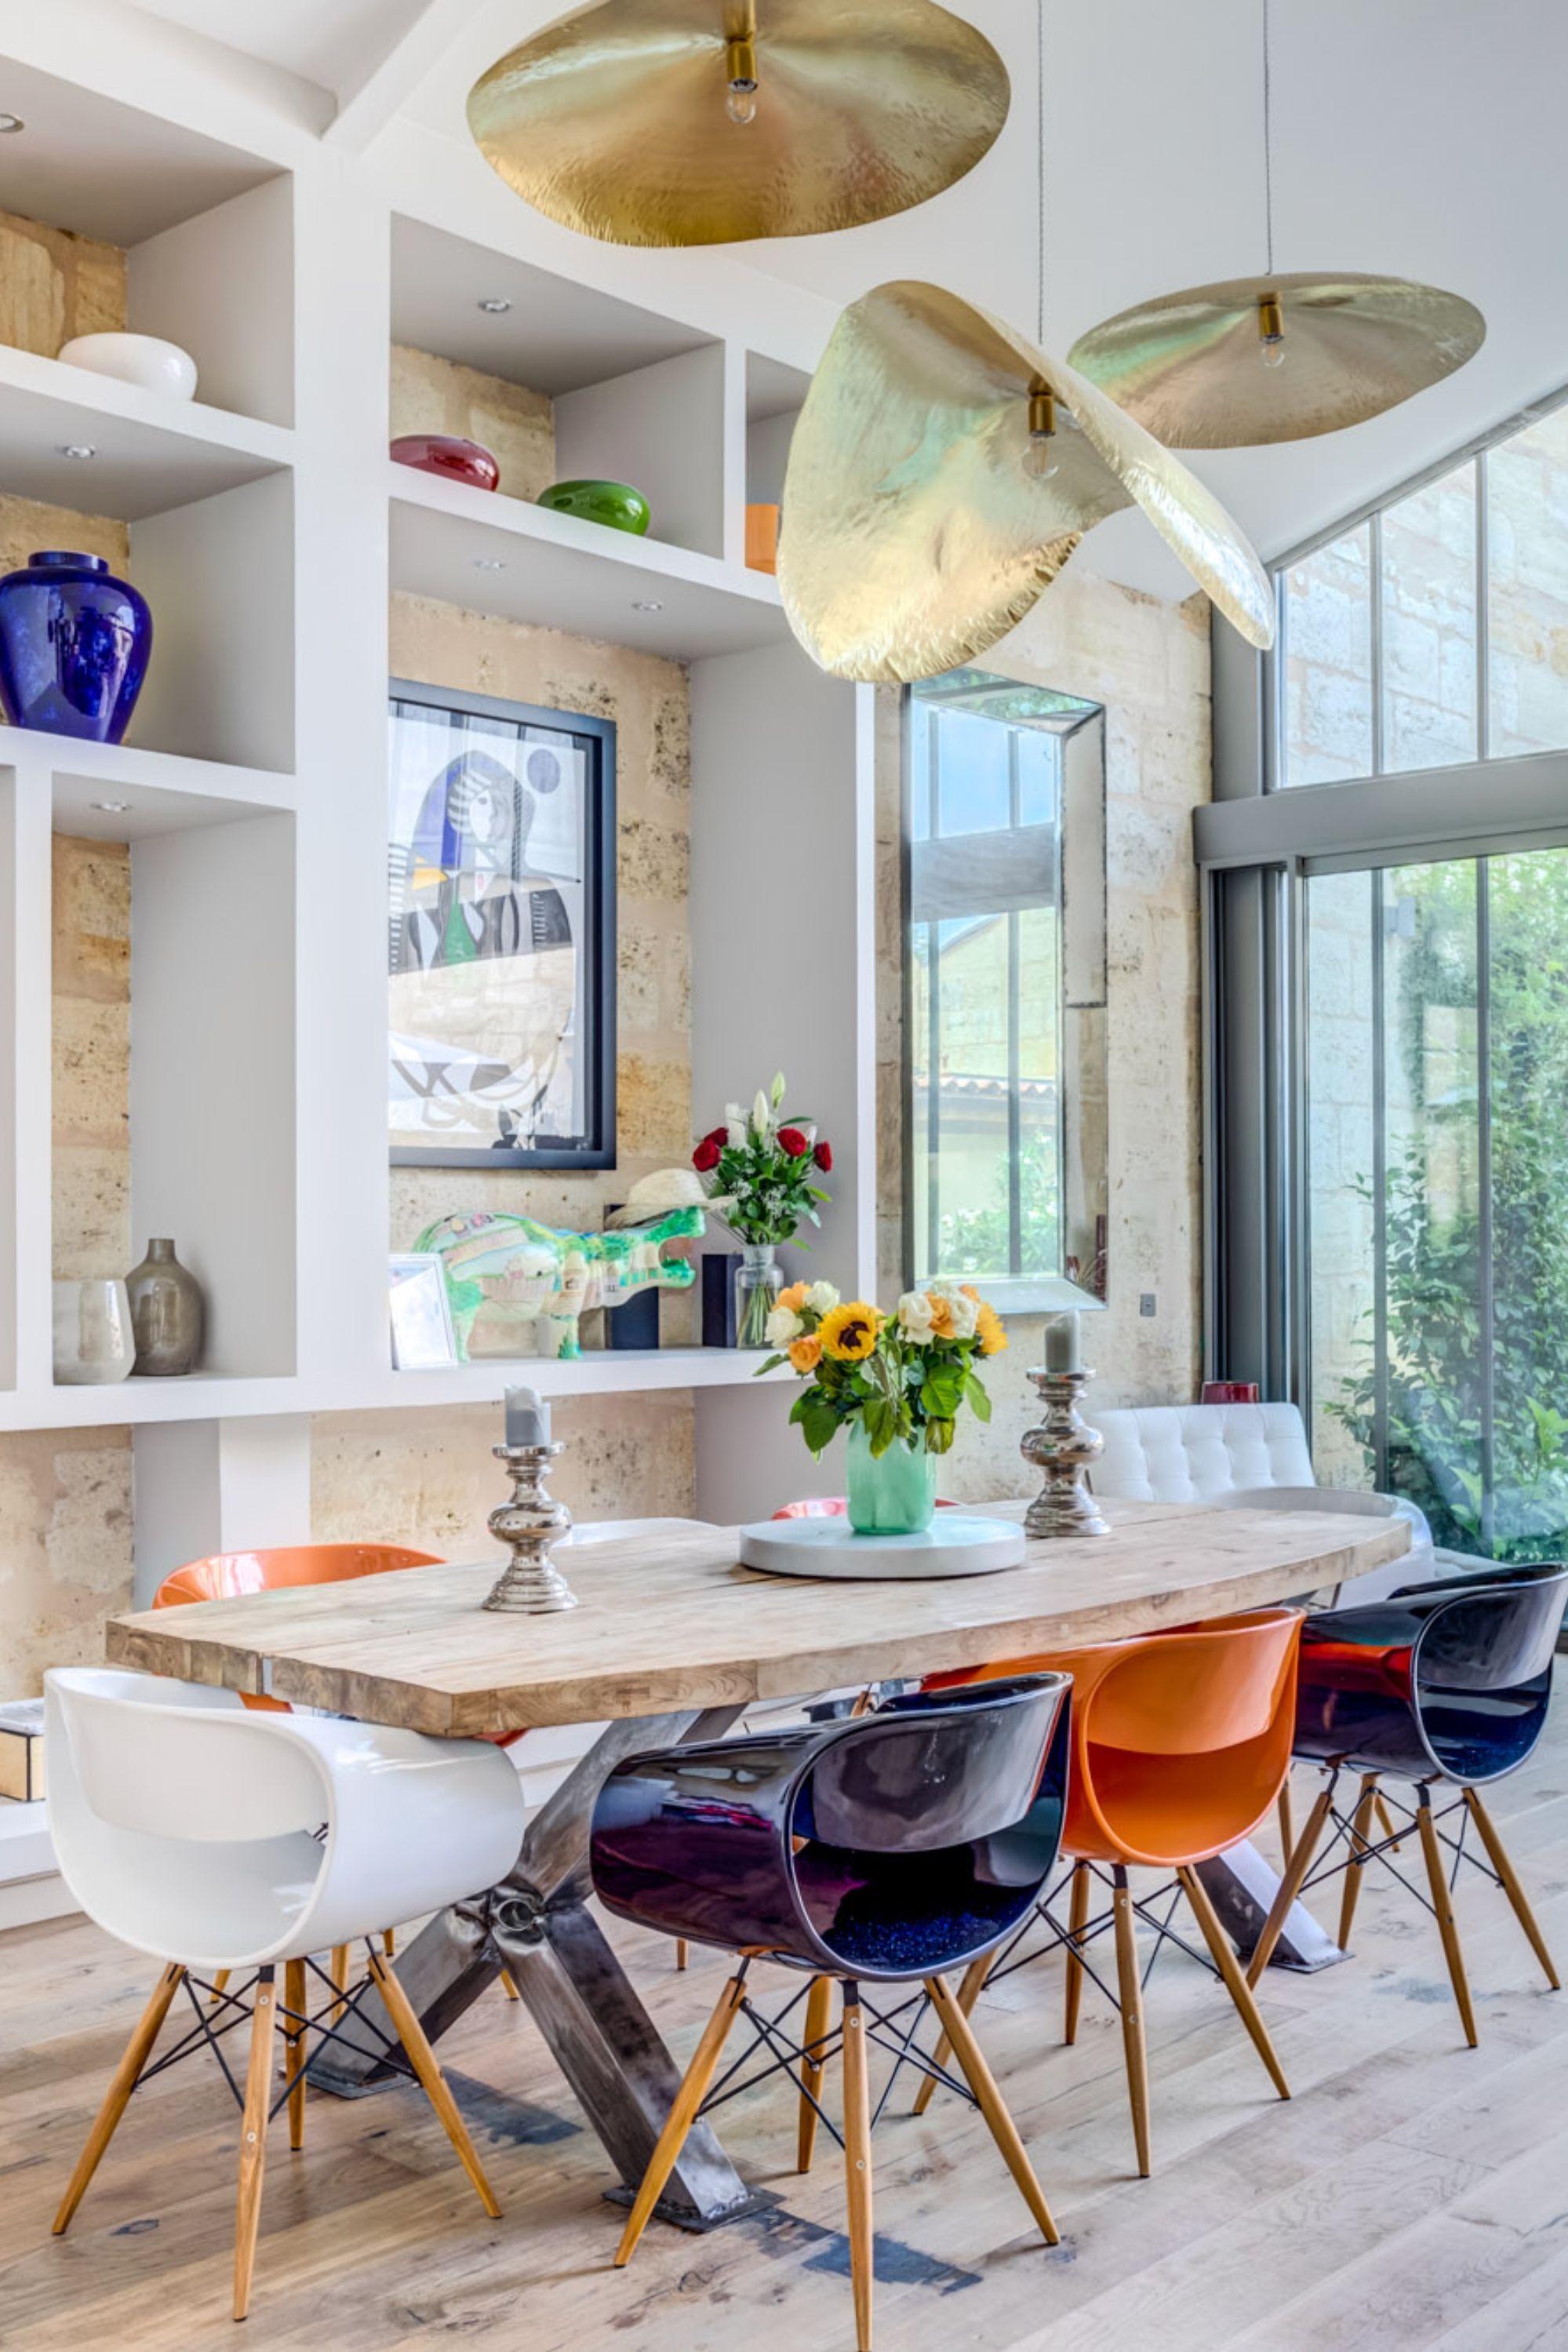 Interiors Homedecor Brass Paolanavone Design Inspirationdeco Decoration Maison Mobilier De Salon Acheter Maison